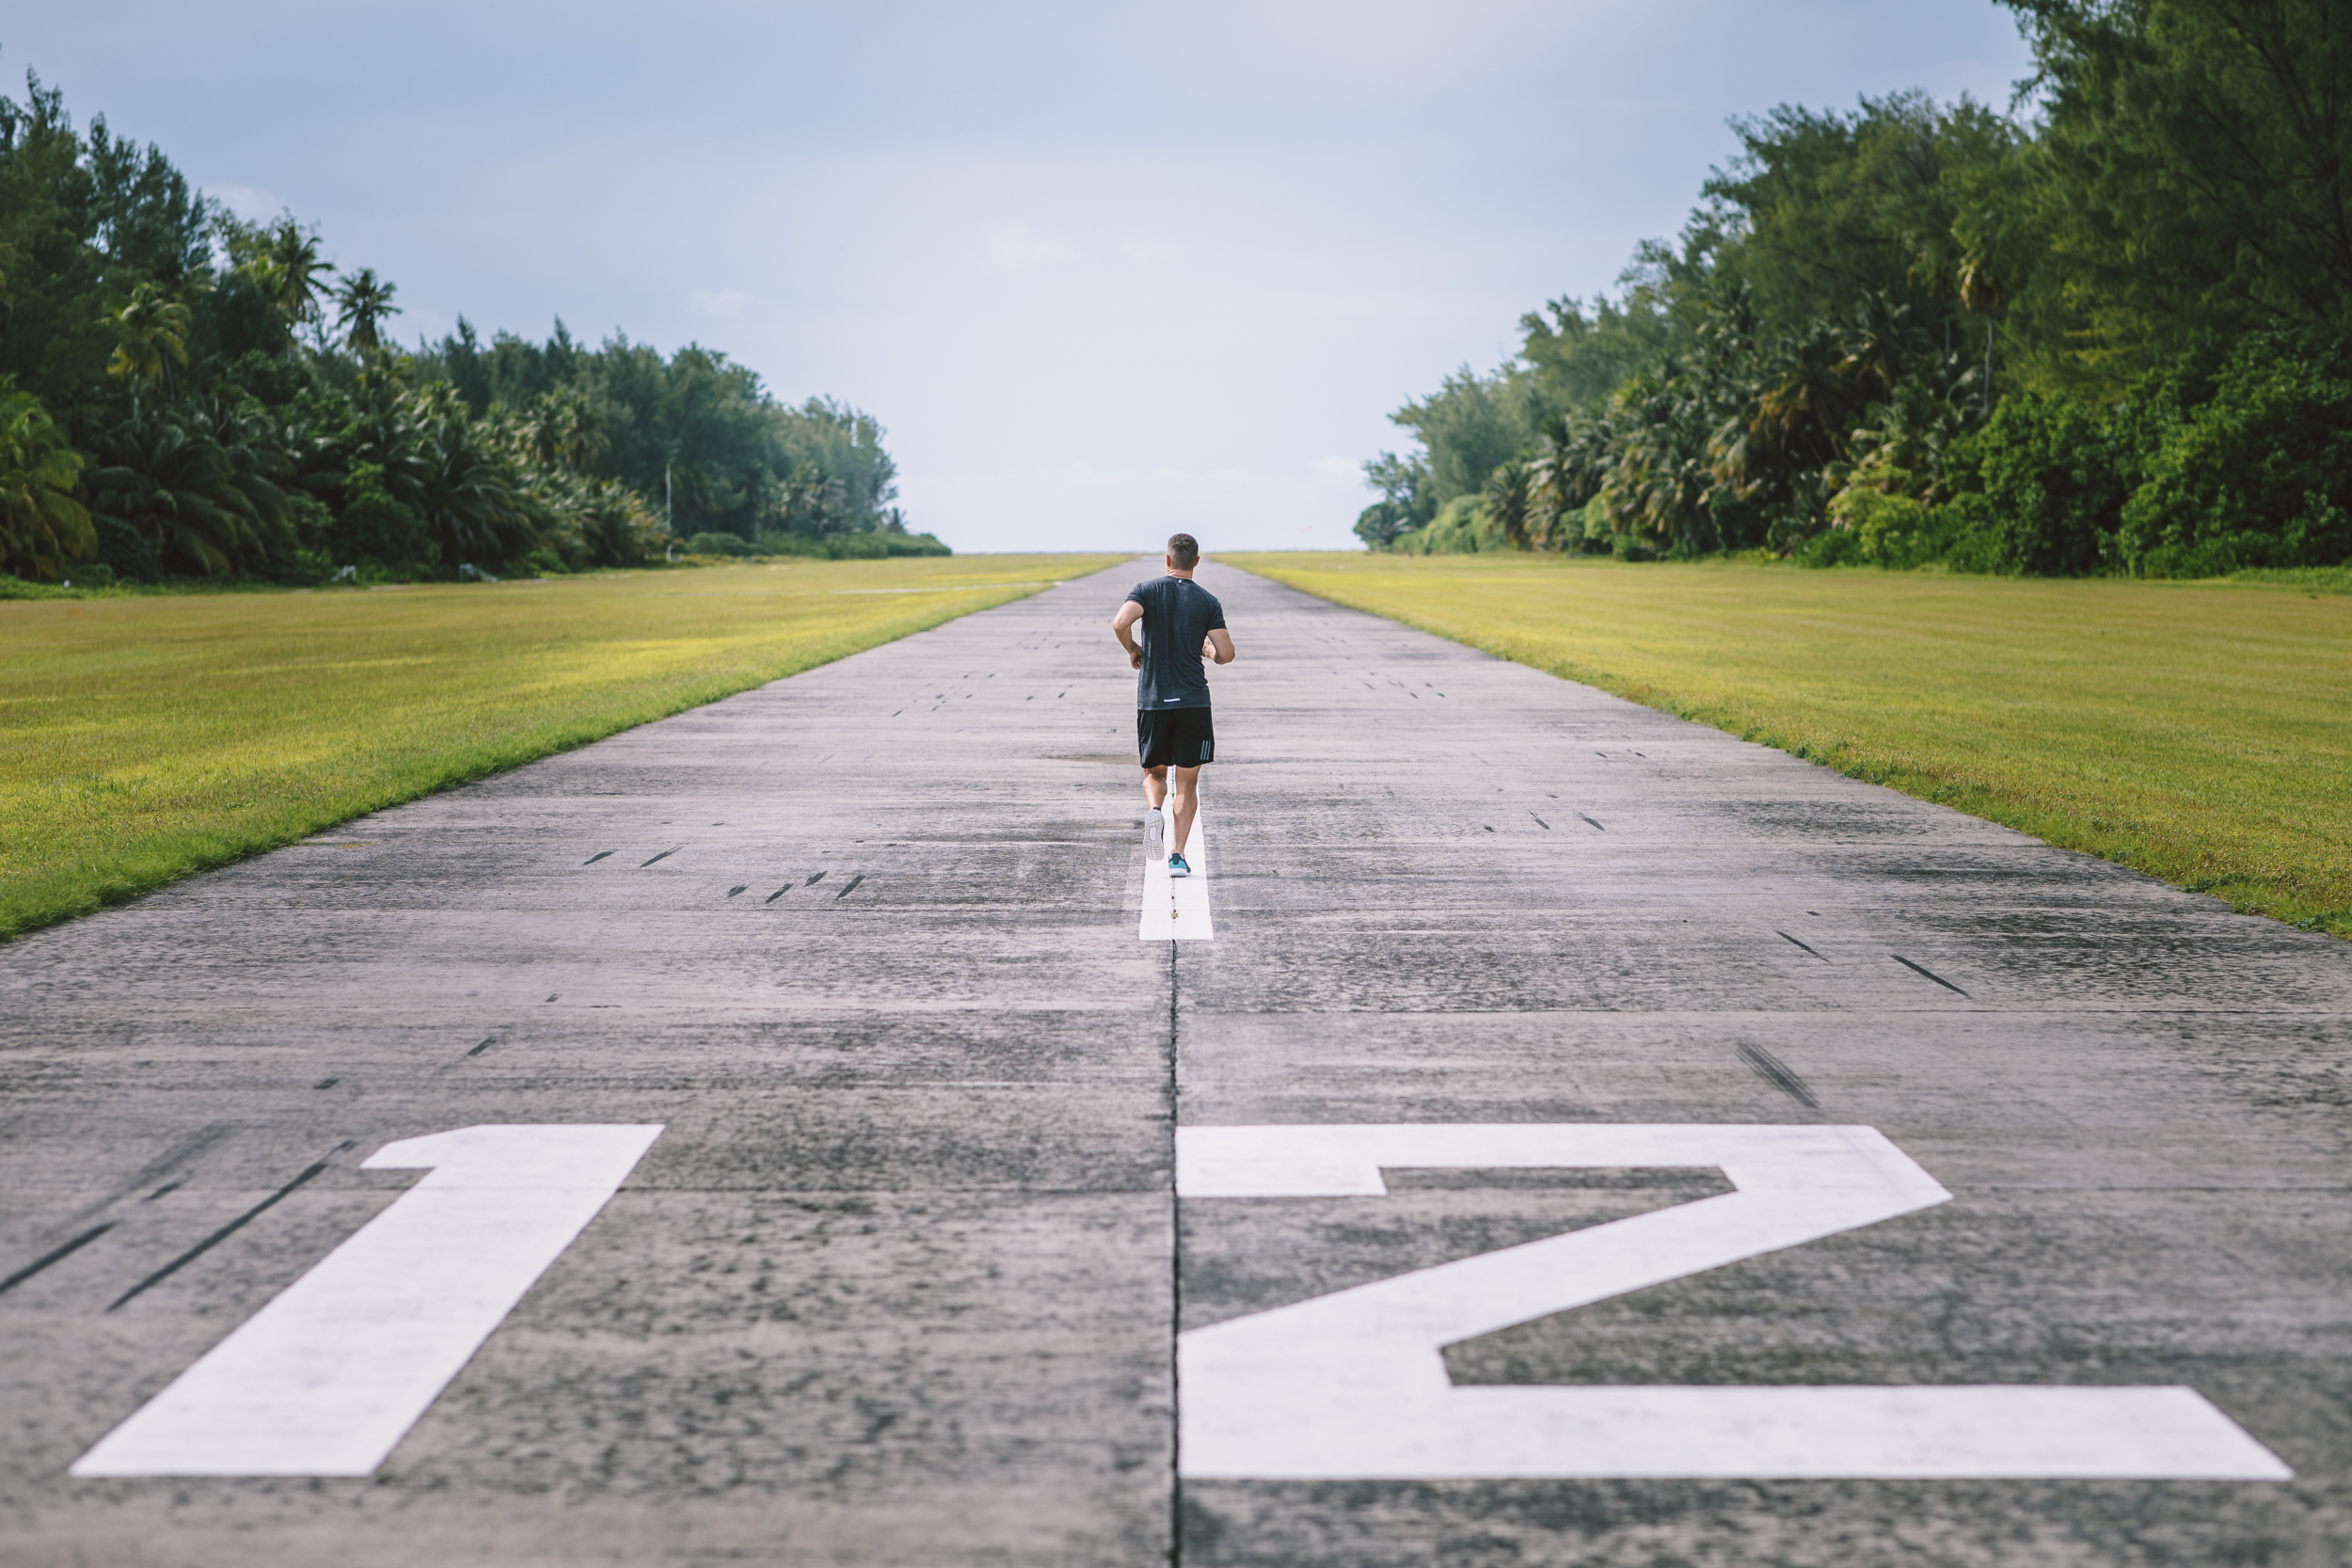 FS Desroches - Running on Runway - 2500px-11.jpg